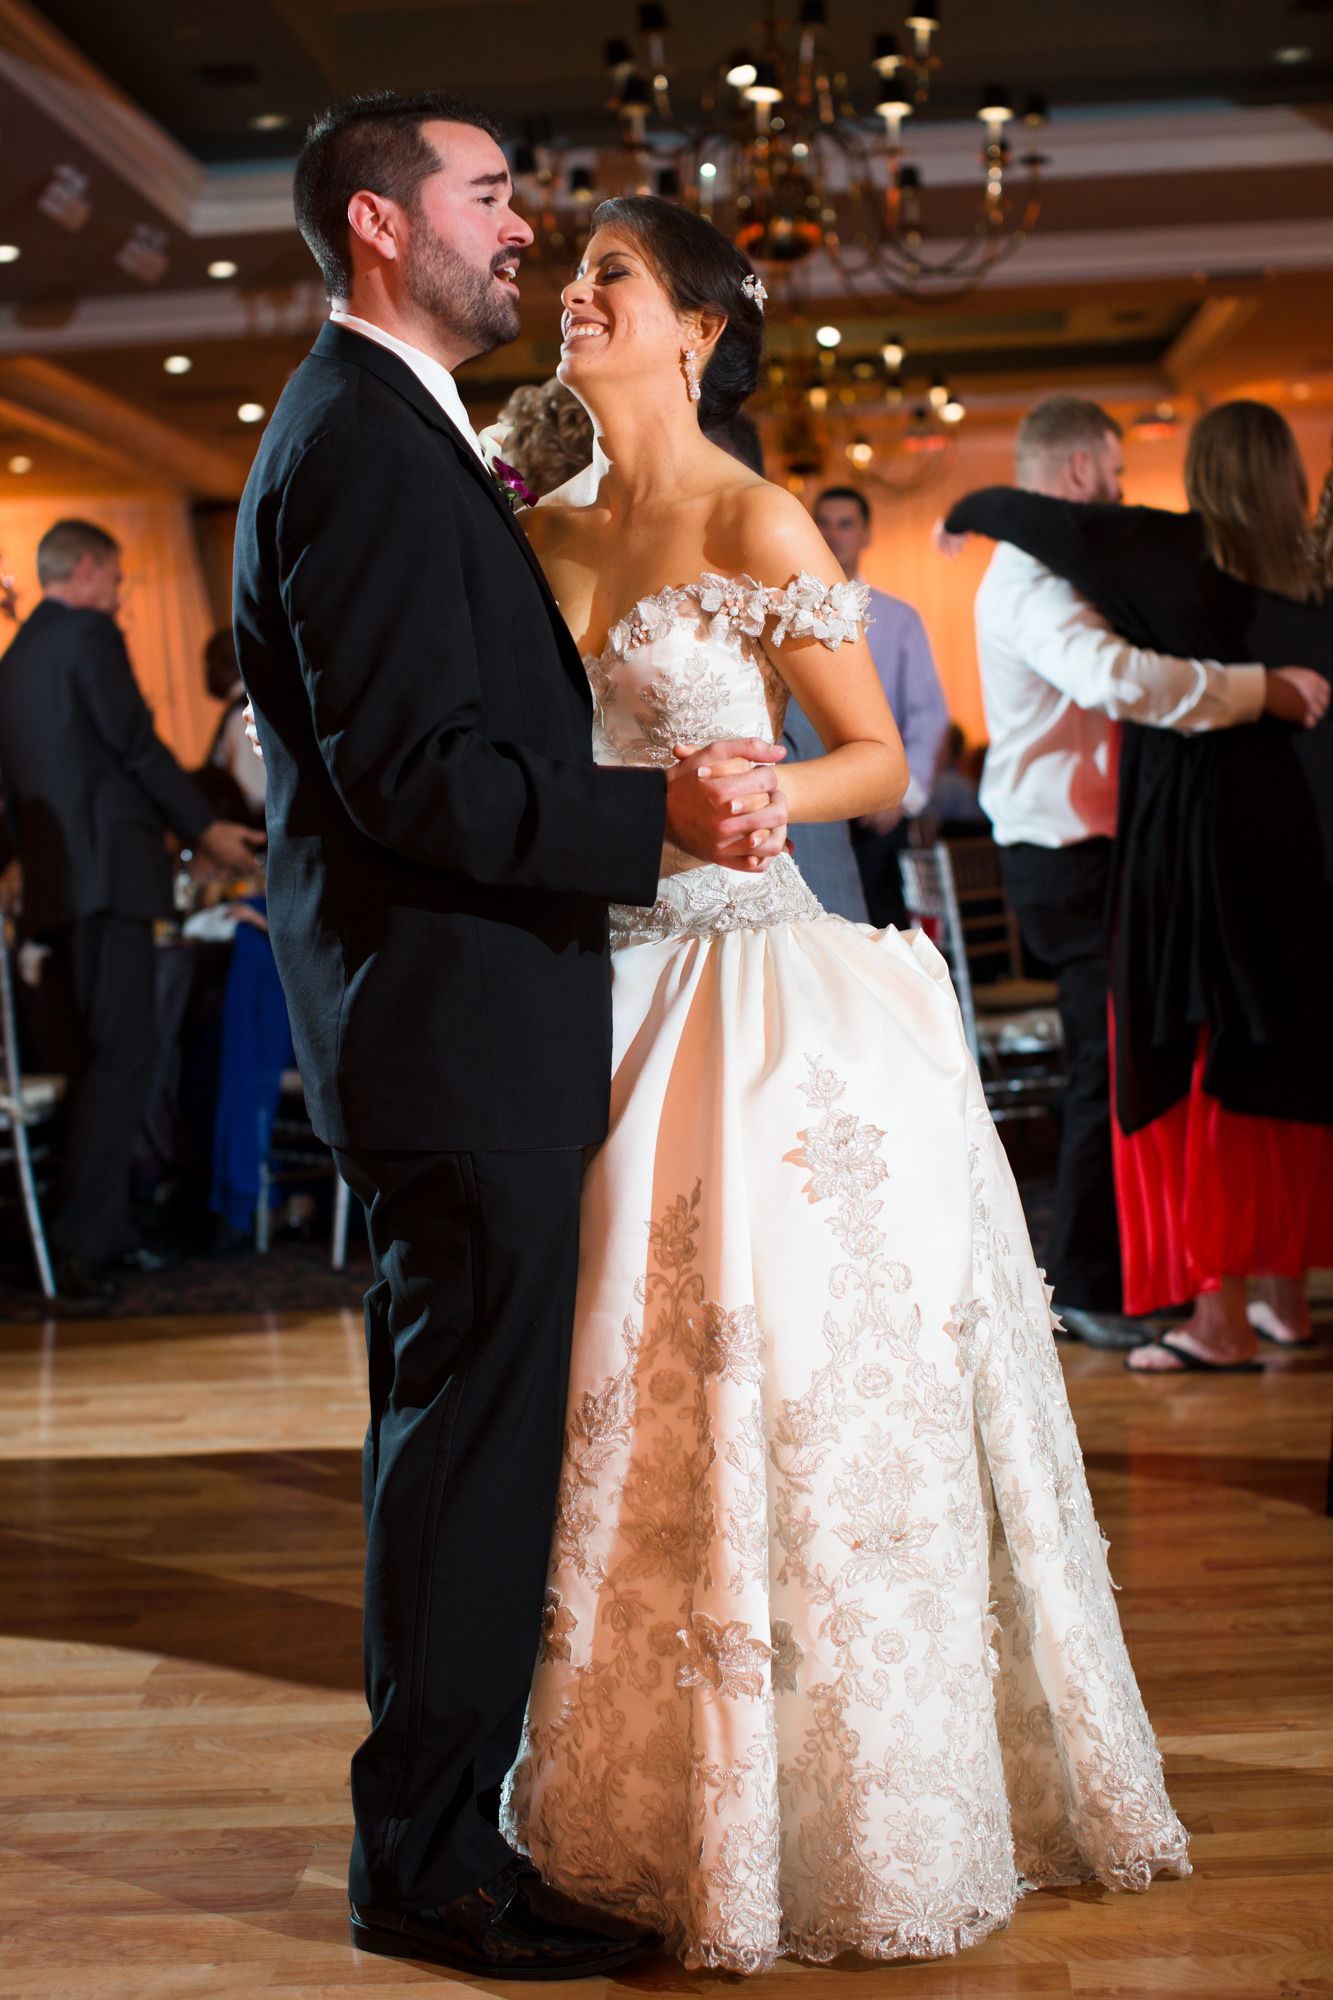 Benvenuto_Wedding_catholic_Florida_Bride-Groom-122.jpg